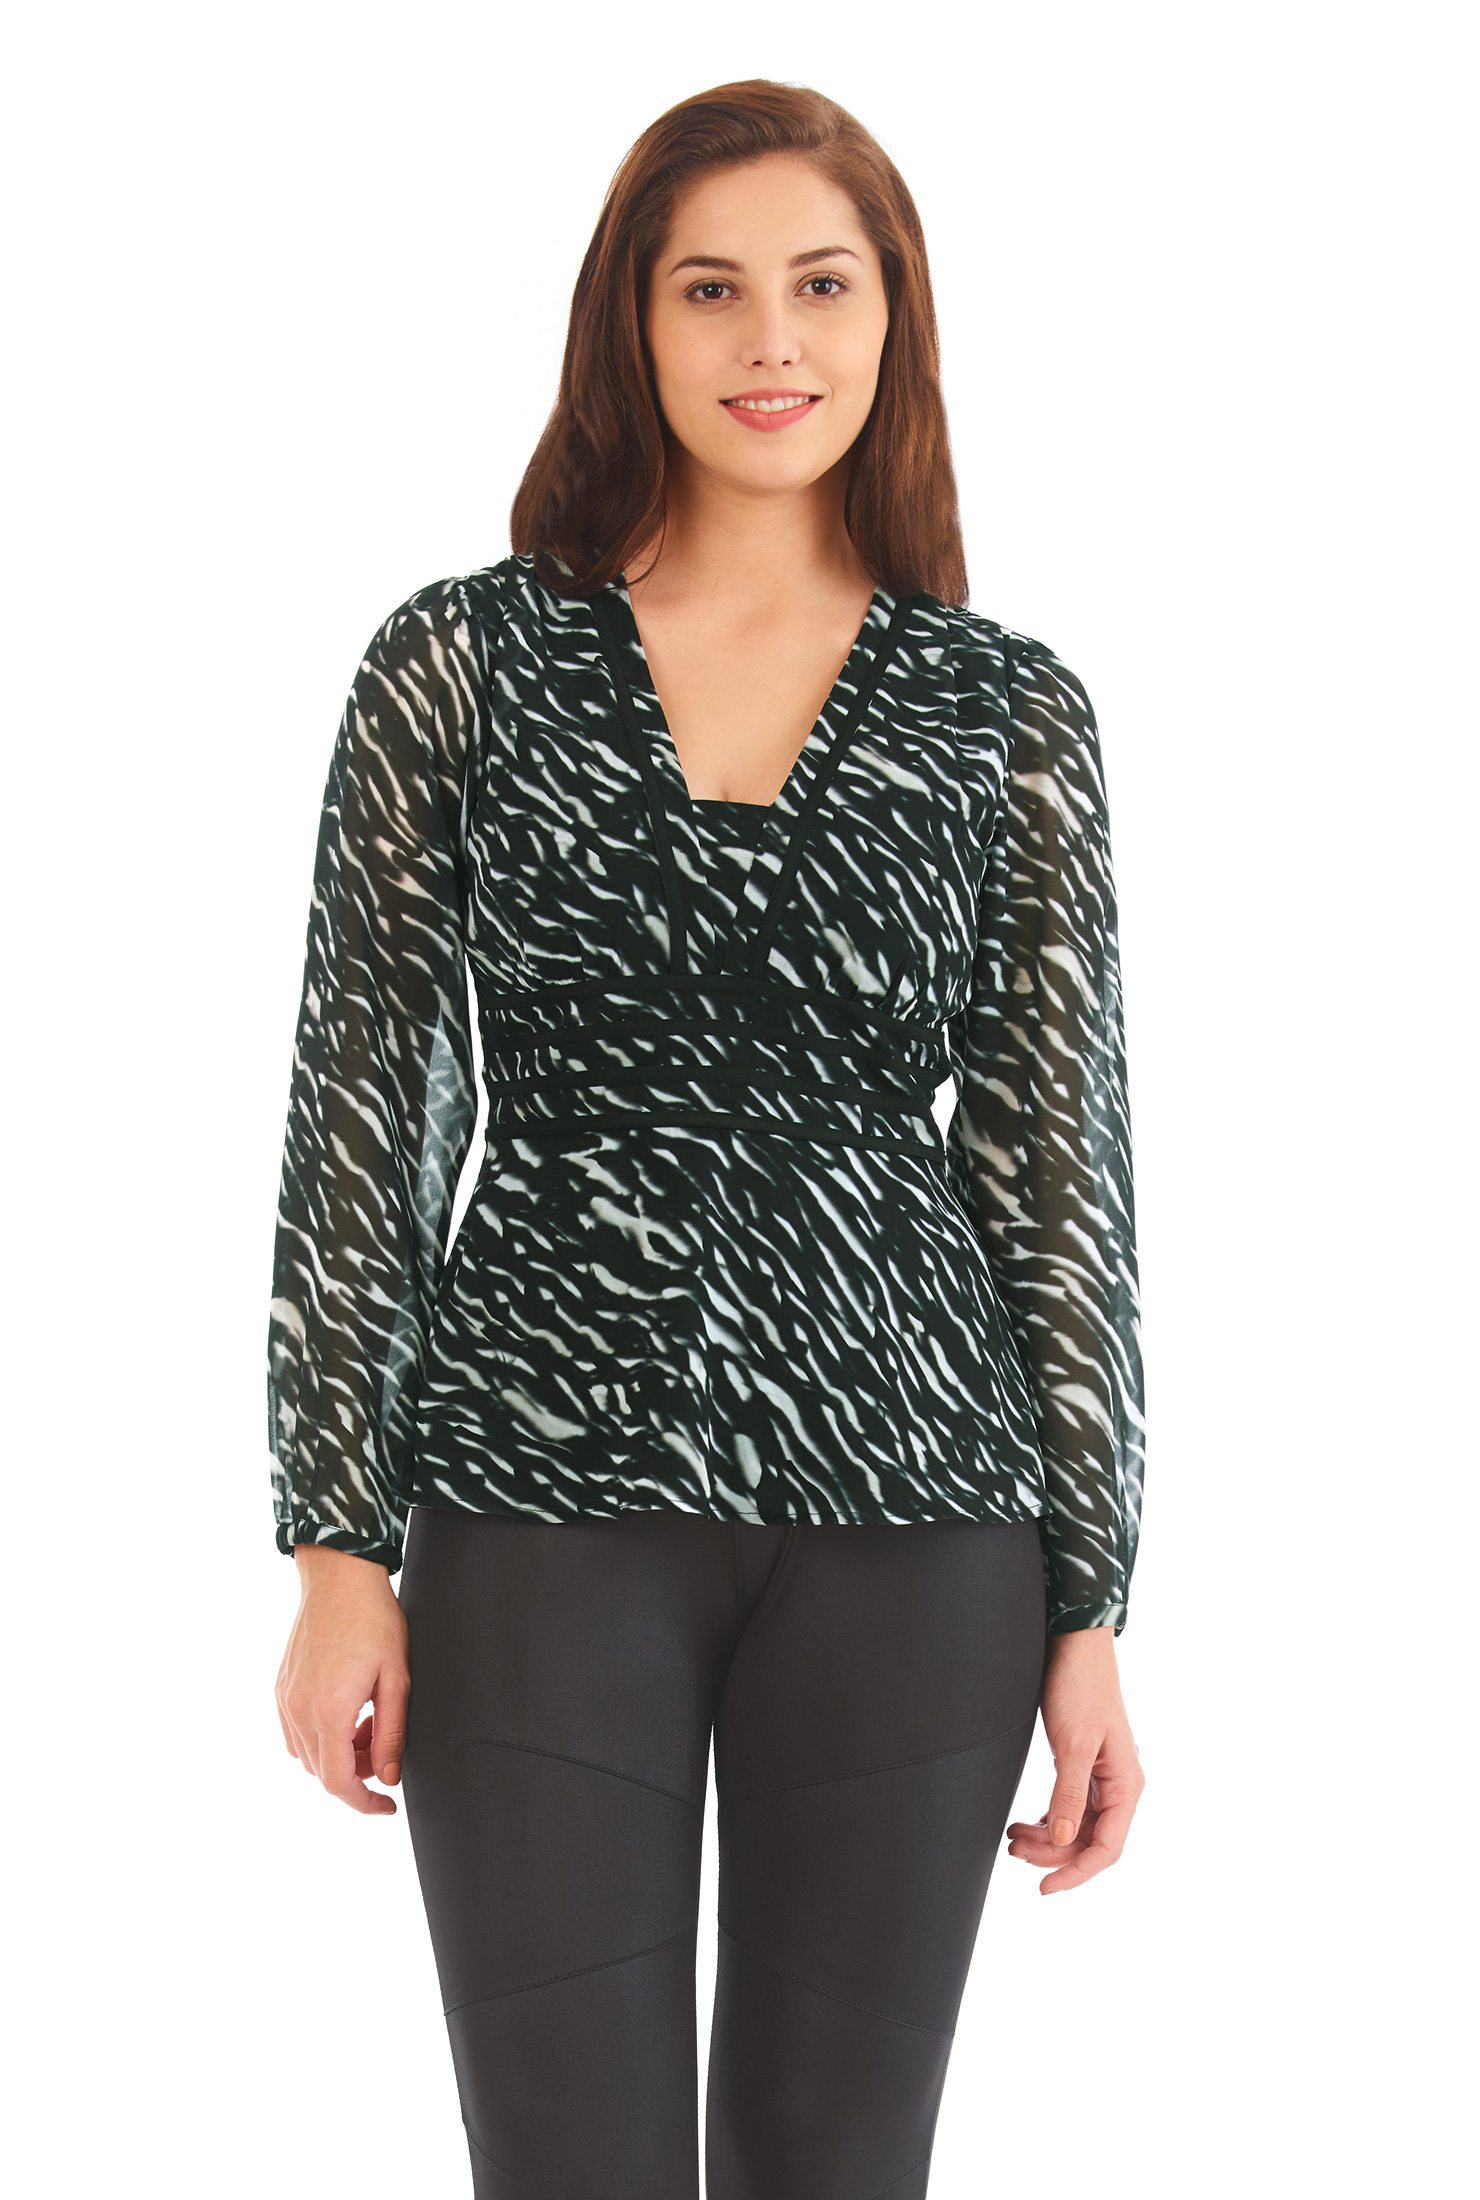 3e6deb5fc5d3 Women s Fashion Clothing 0-36W and Custom